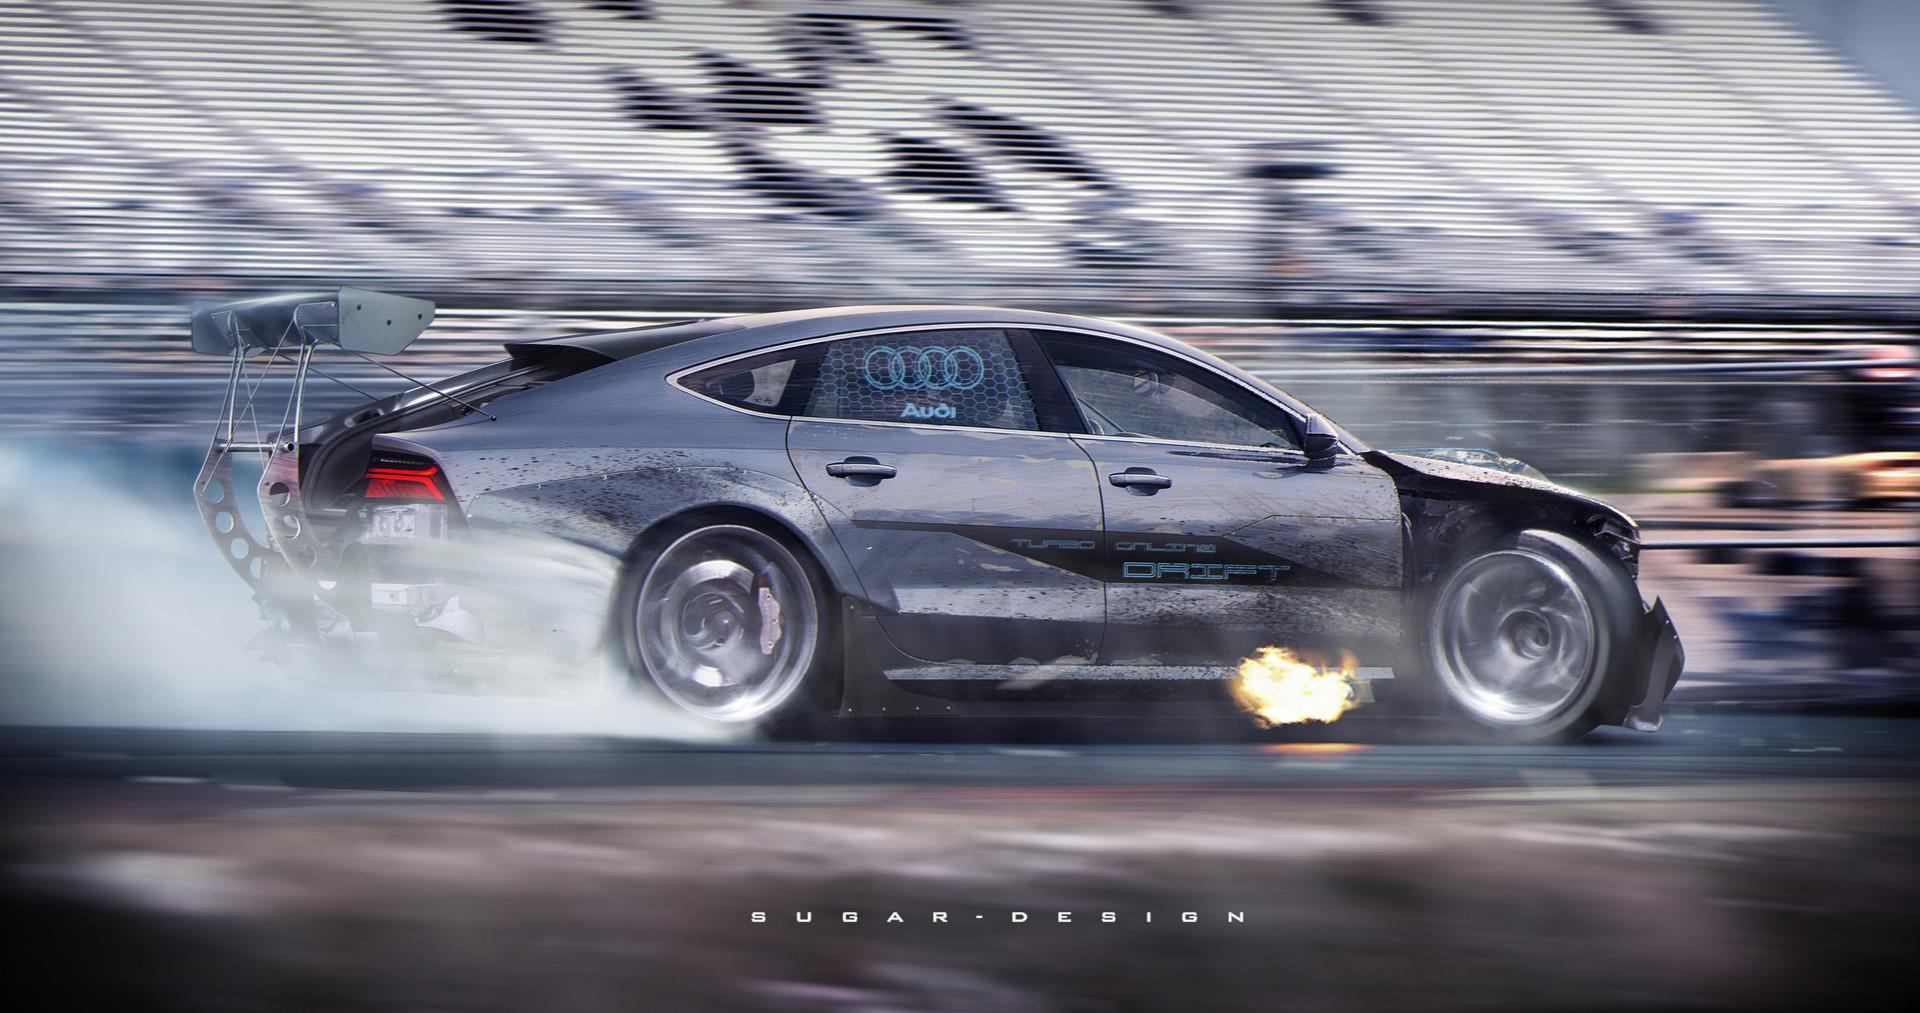 Artstation Audi Rs7 Drift Racing Sugar Chow